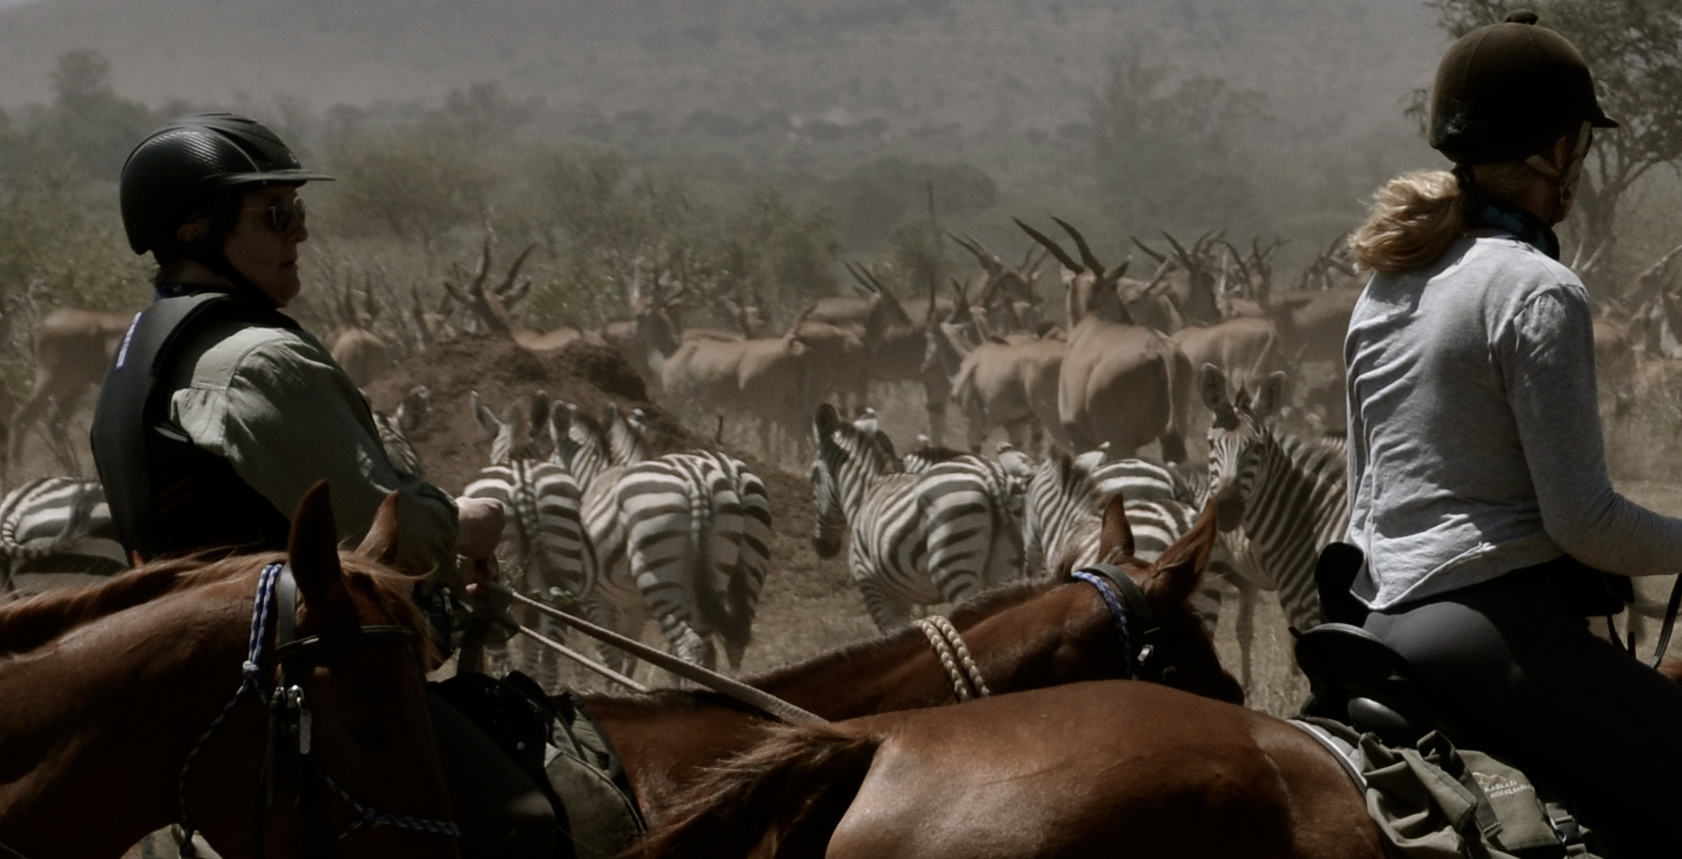 Safari te paard in Kaskazi / Tanzania - Vakantie te paard / Reisbureau Perlan